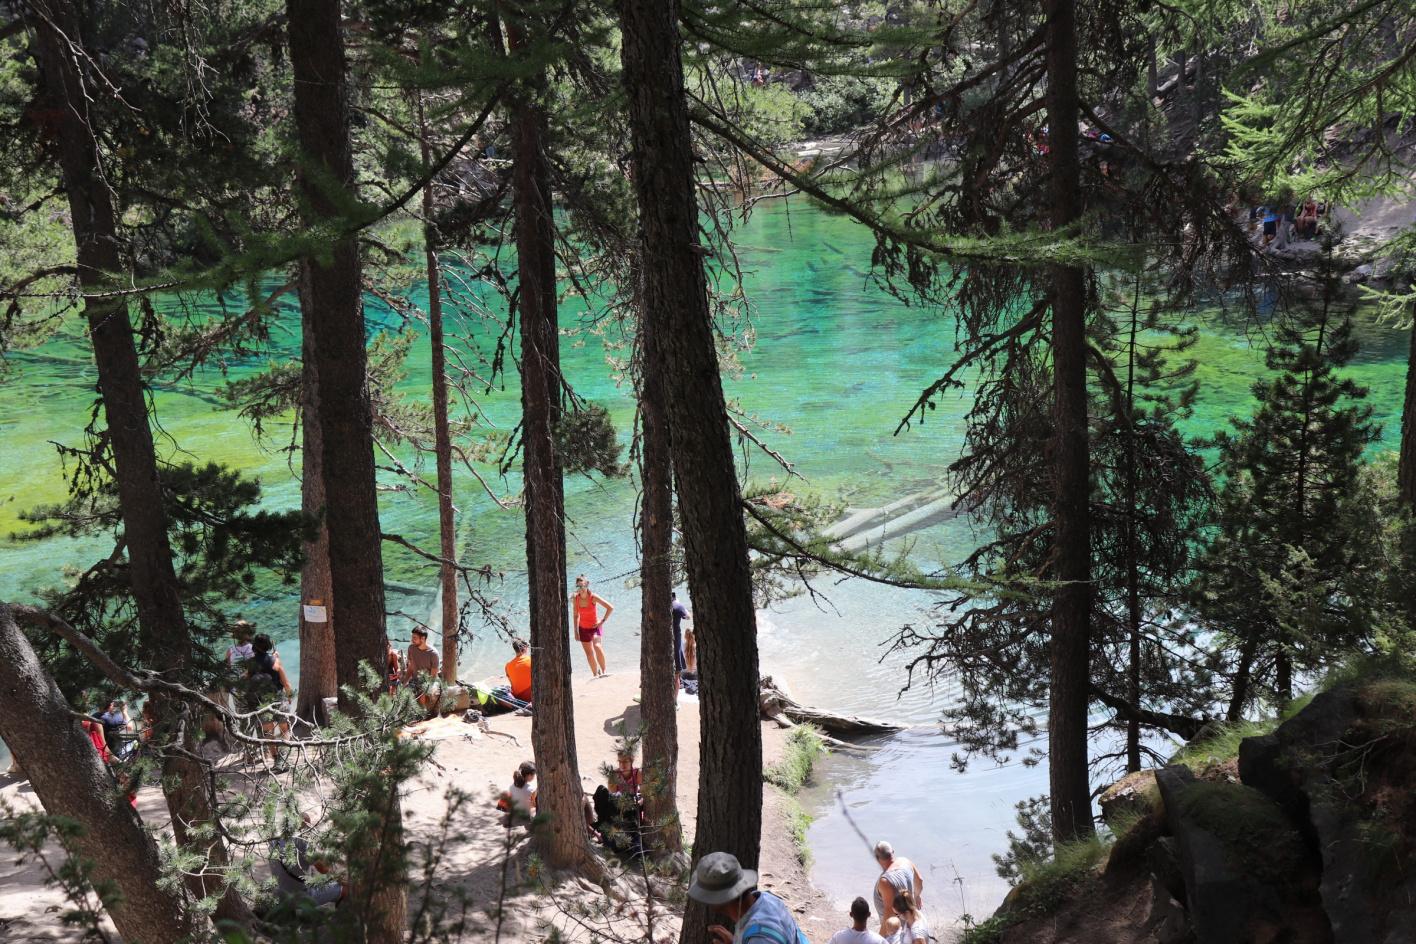 lago verde prali, lac vert nevachè